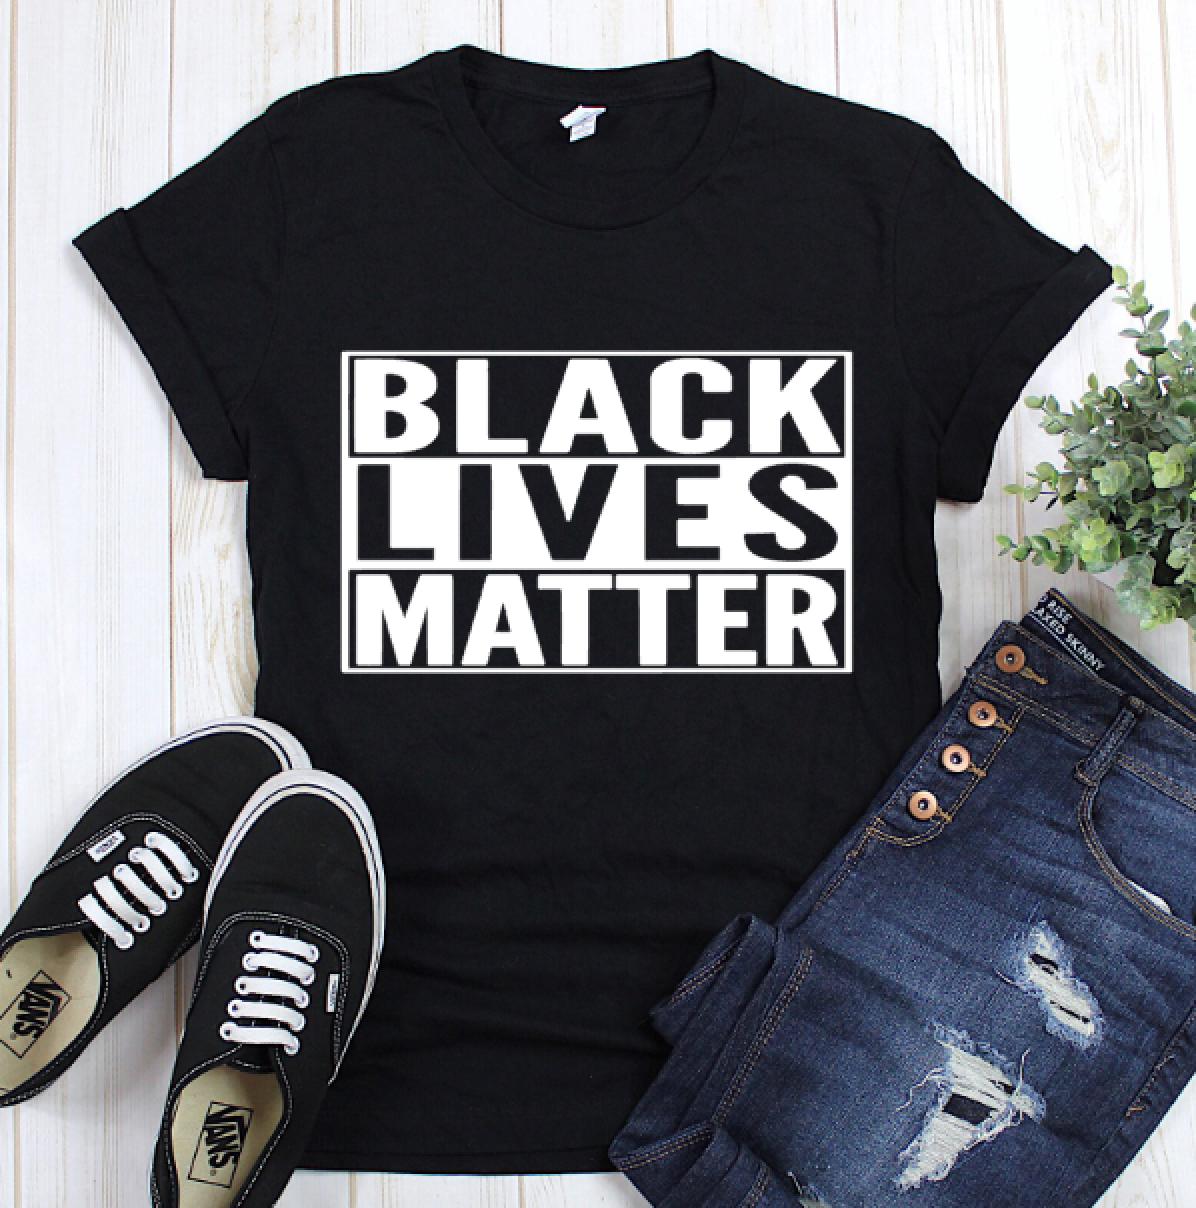 Black Lives Matter - orangeshine.com